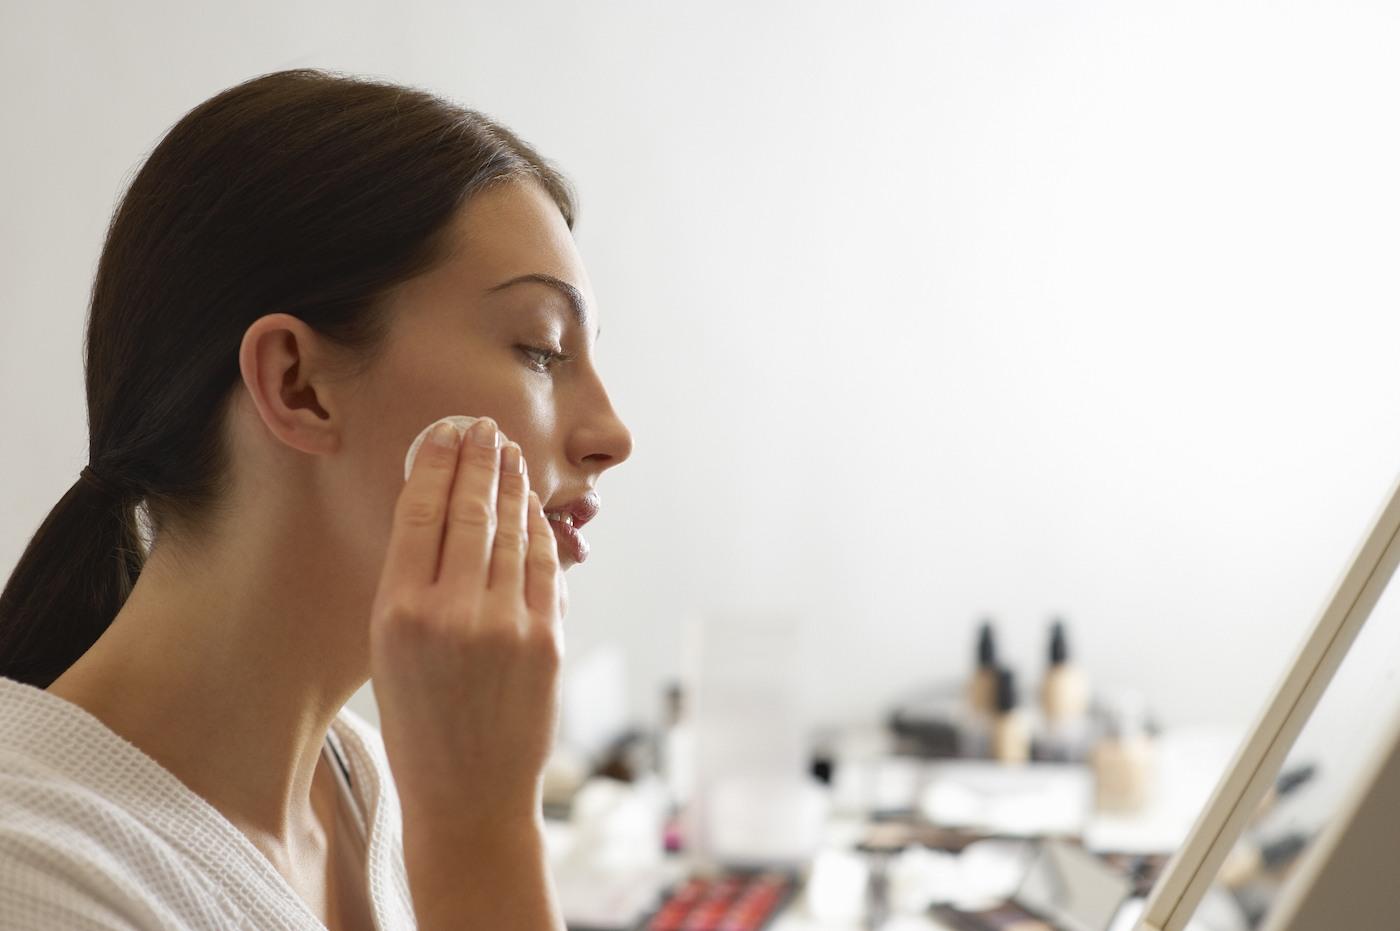 makeup removing